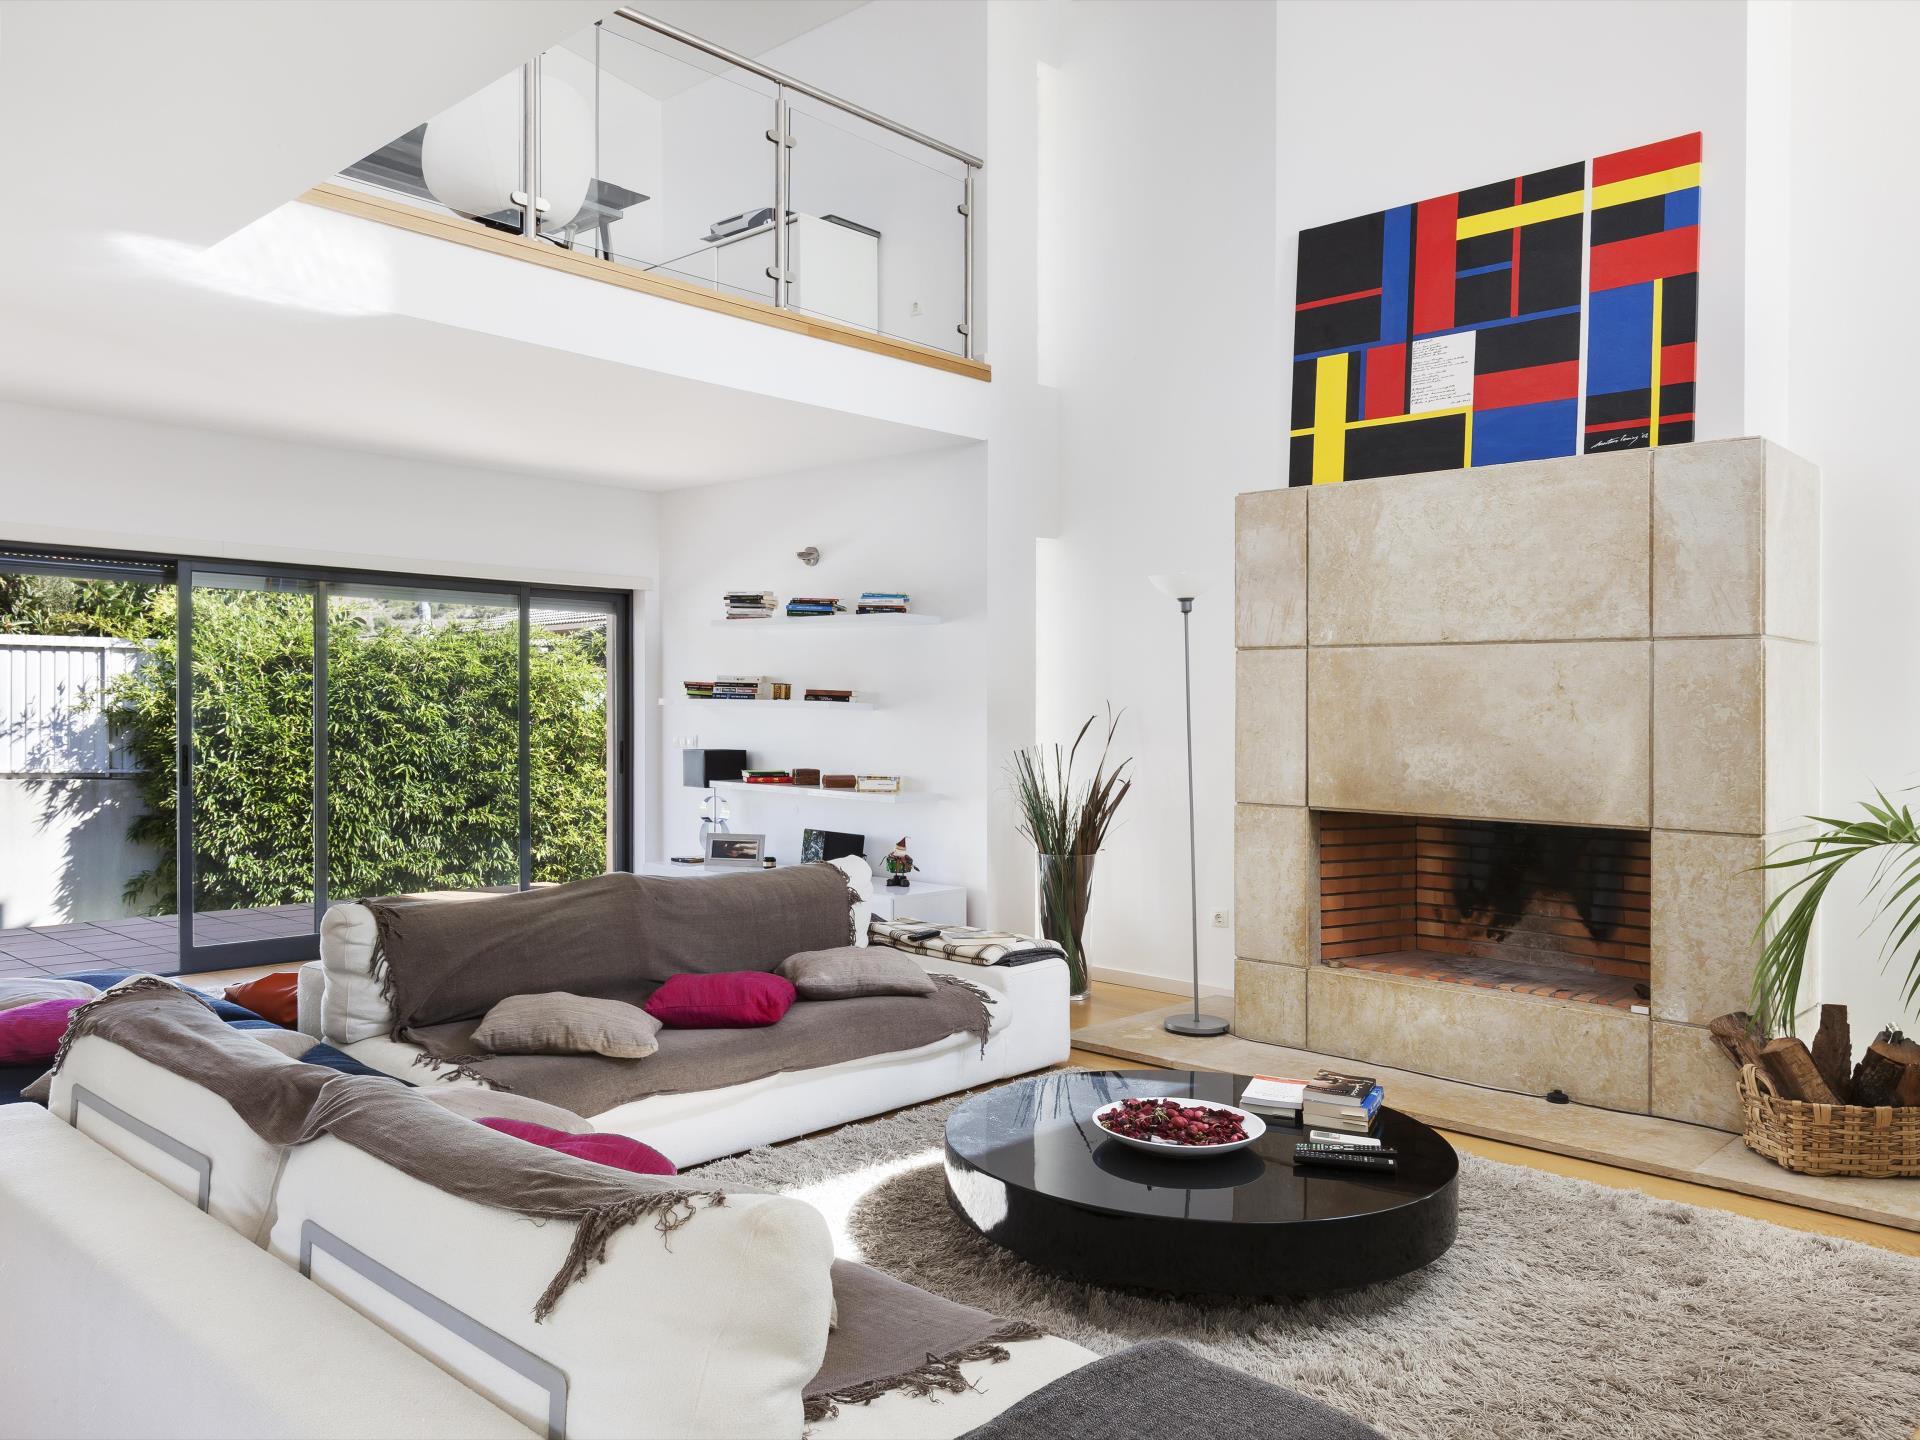 Einfamilienhaus für Verkauf beim Detached house, 4 bedrooms, for Sale Cascais, Lissabon Portugal